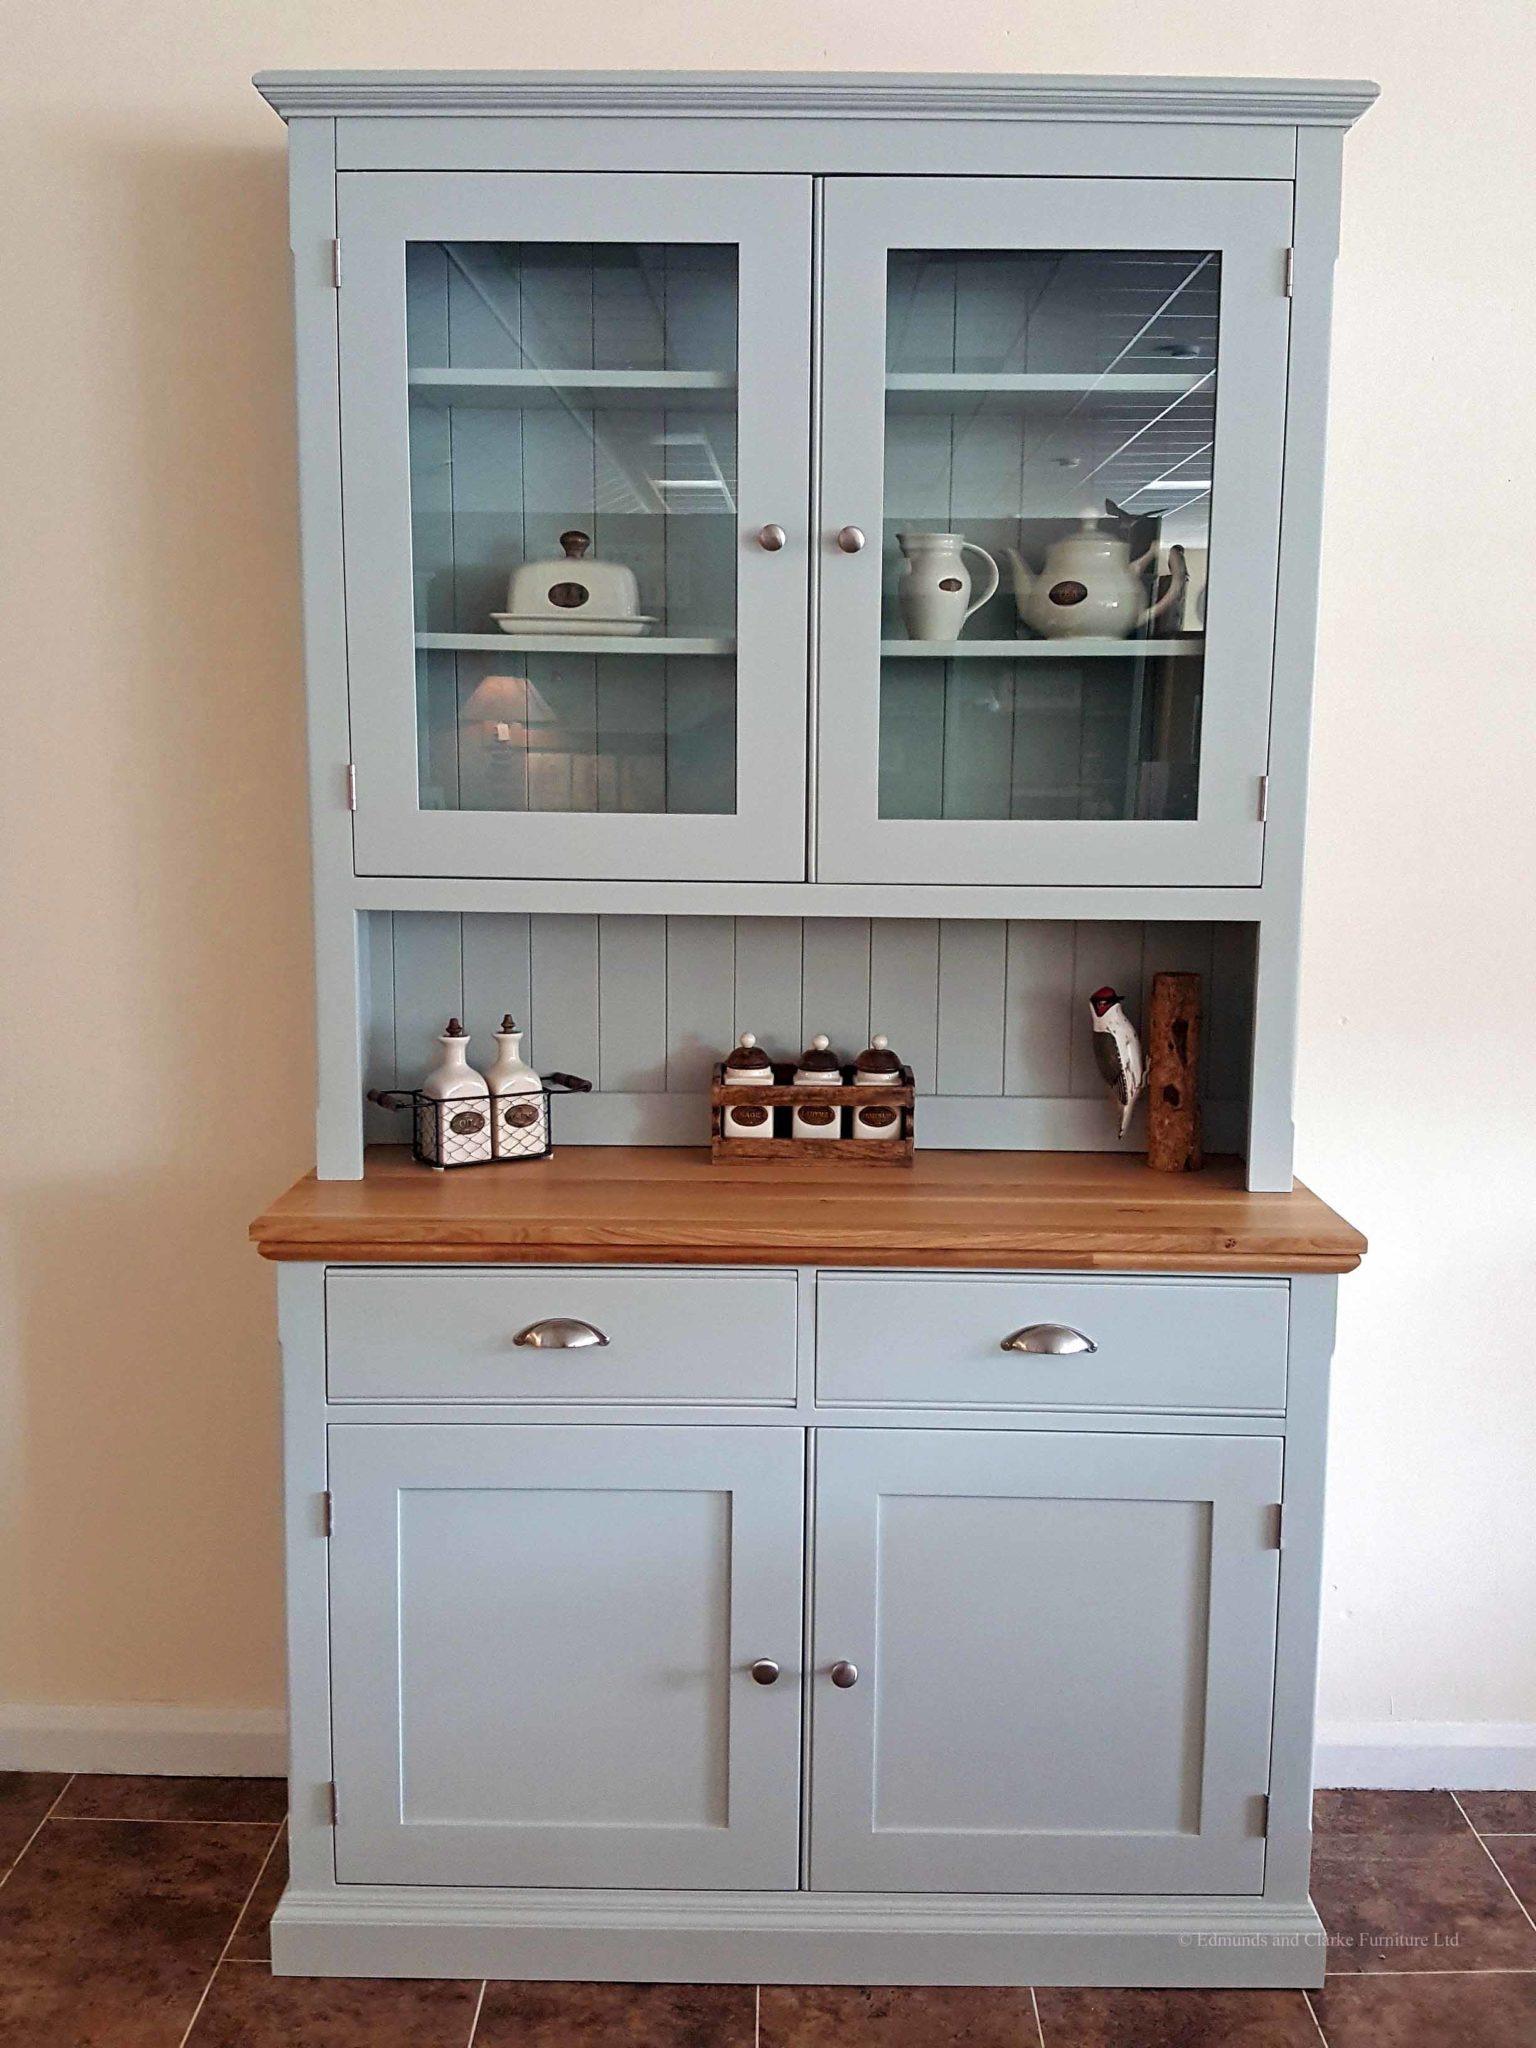 Edmunds painted 4ft half glazed dresser. sideboard has moulded oak top with 2 drawers and 2 doors. EDM011